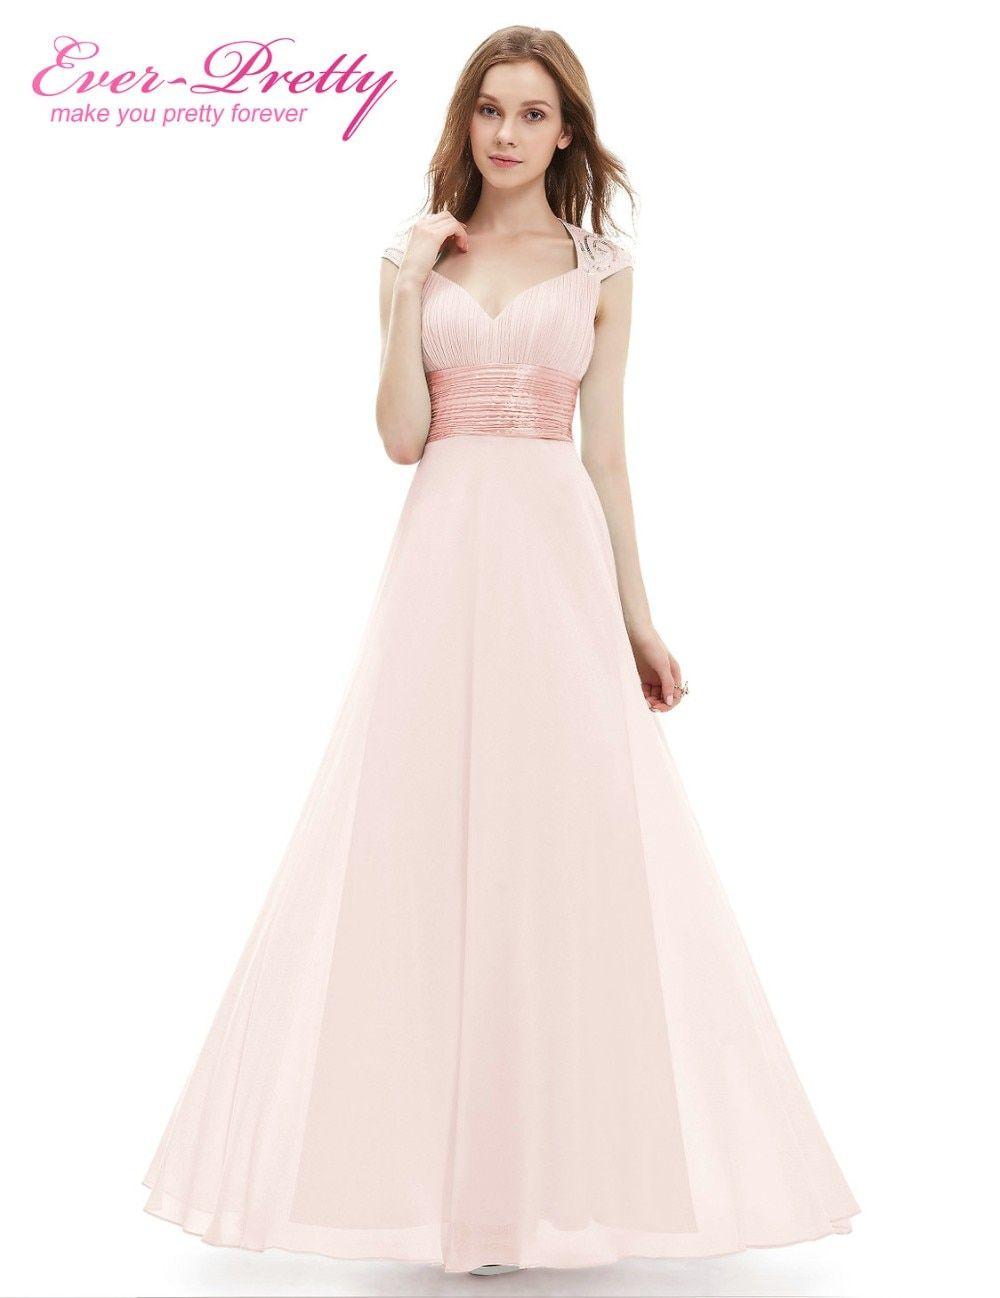 5c3285c0e1da Robe De Soiree Longue 2018 Elegant Evening Dresses Ever Pretty Floor Length  V-neck Long Formal Prom Party Gowns Vestido De Festa free shipping worldwide